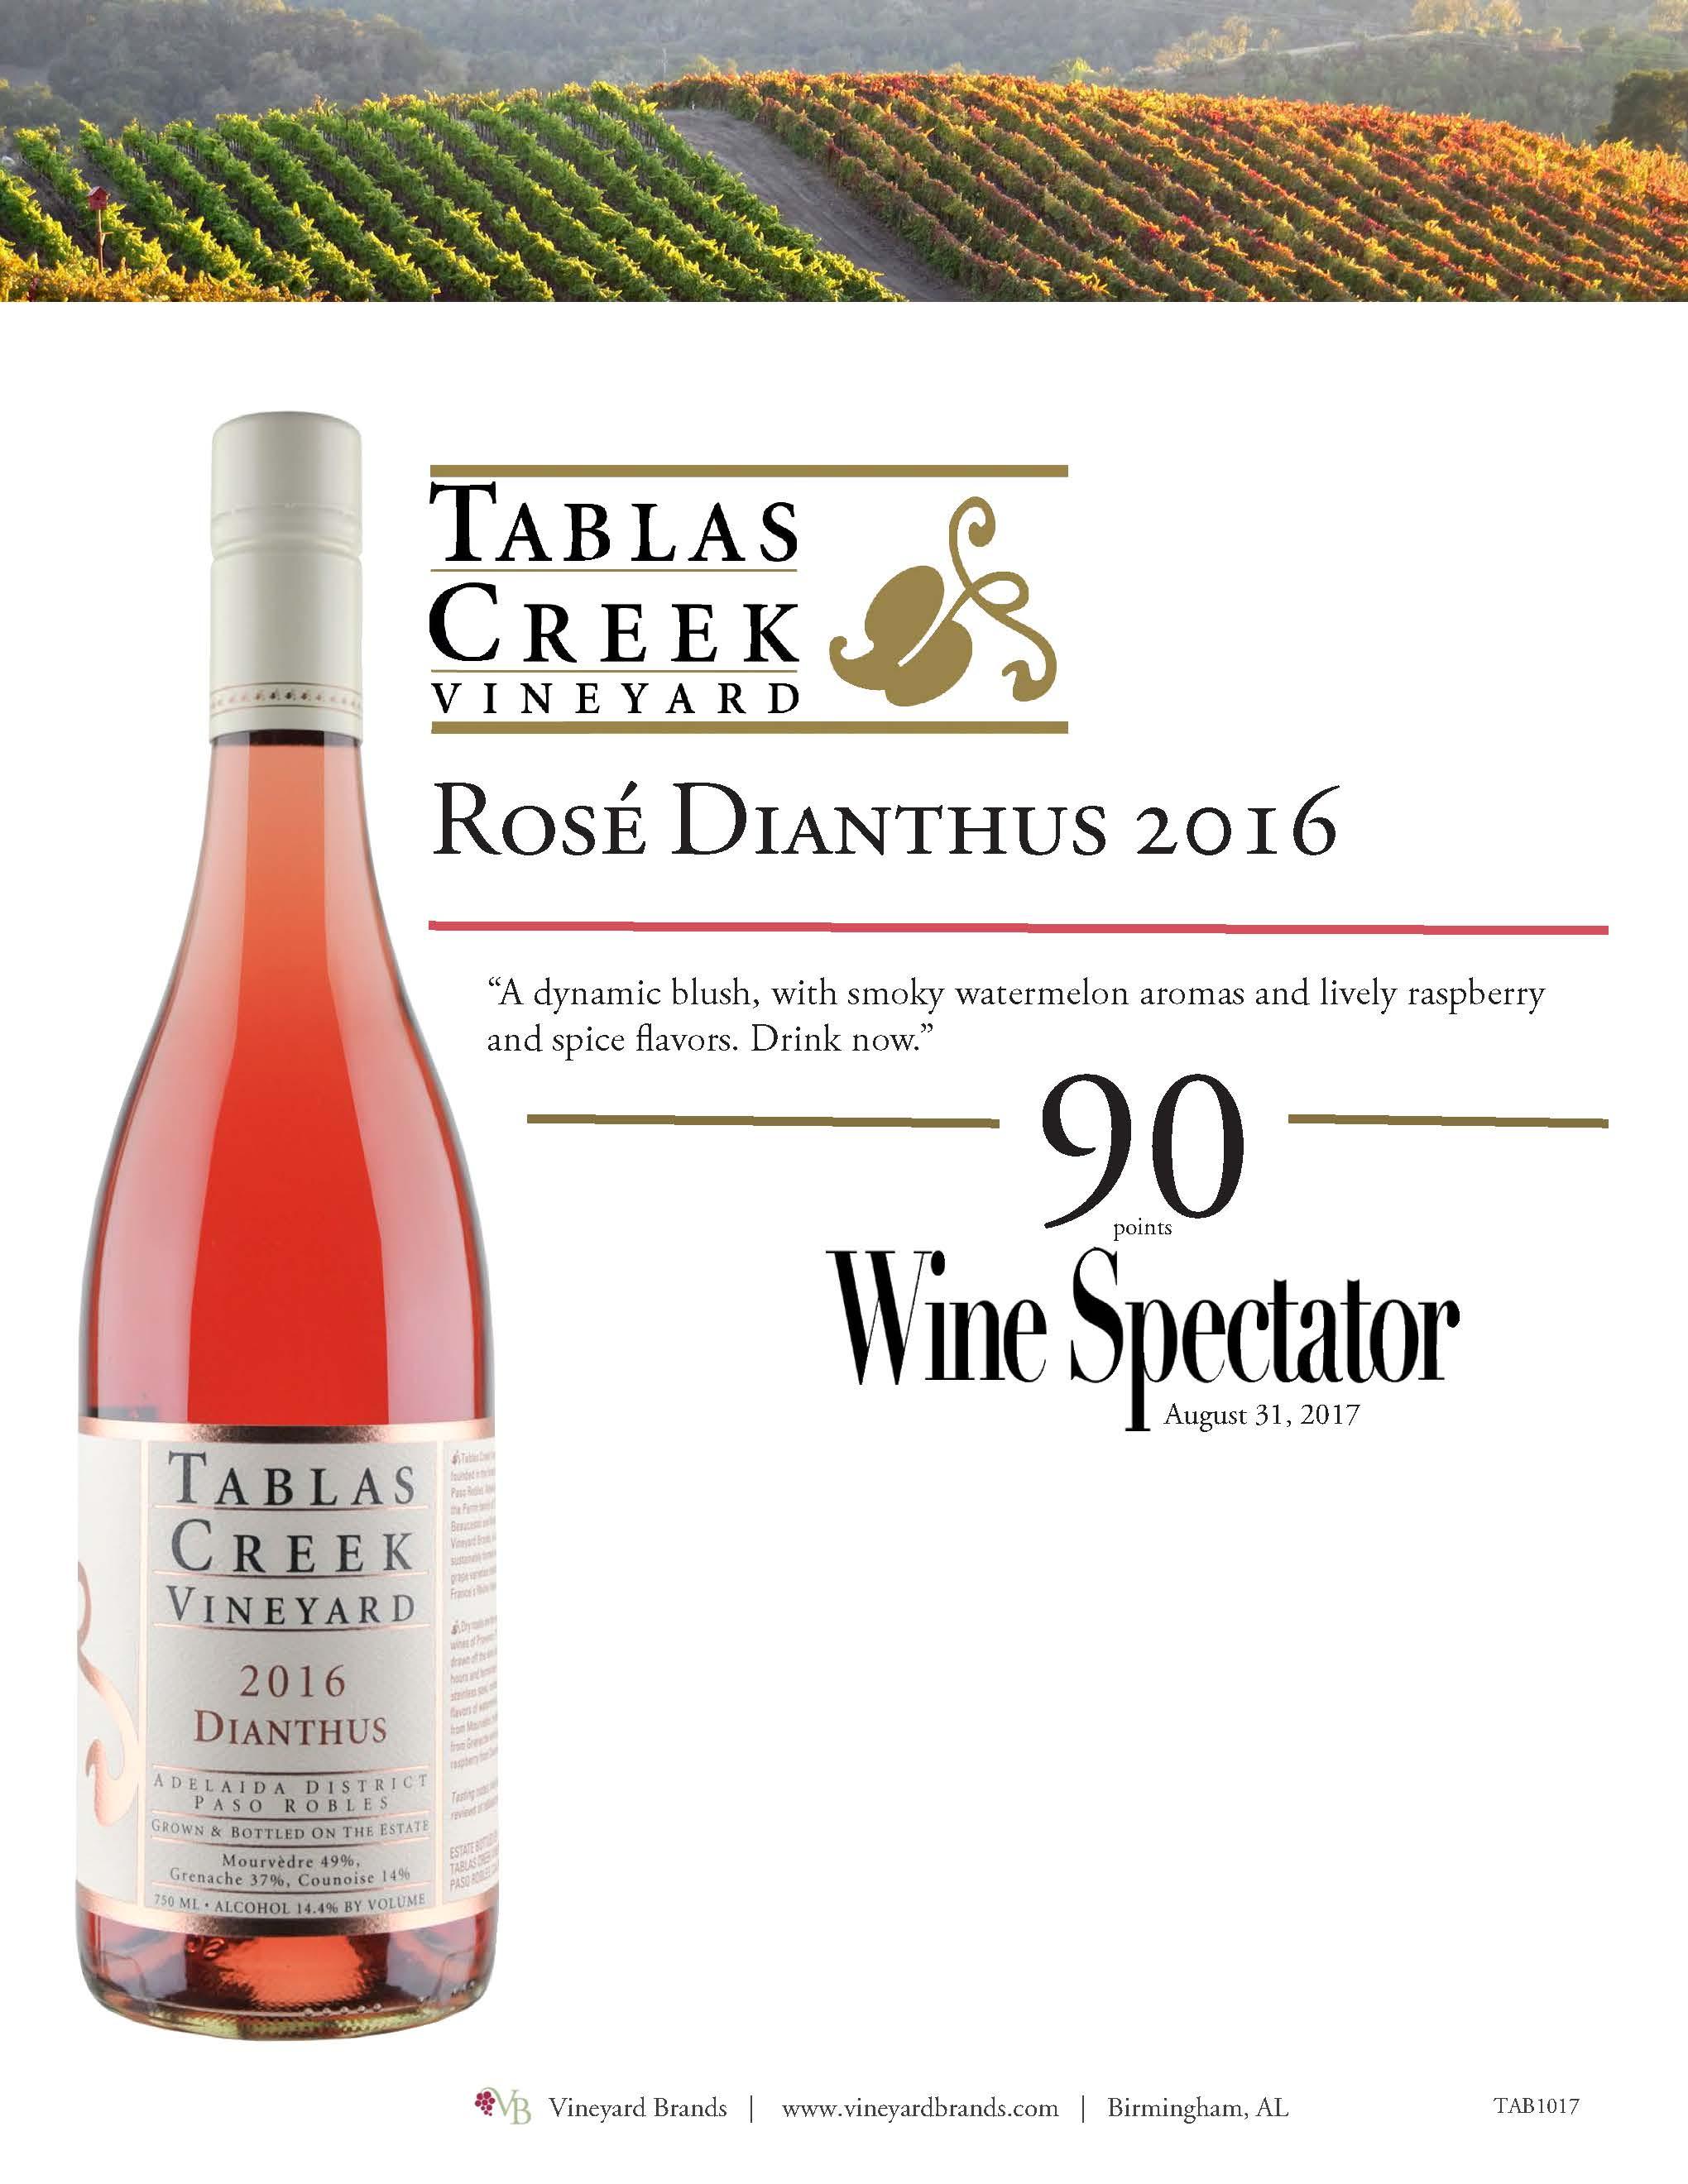 Tablas Creek Rose Dianthus 2016.jpg